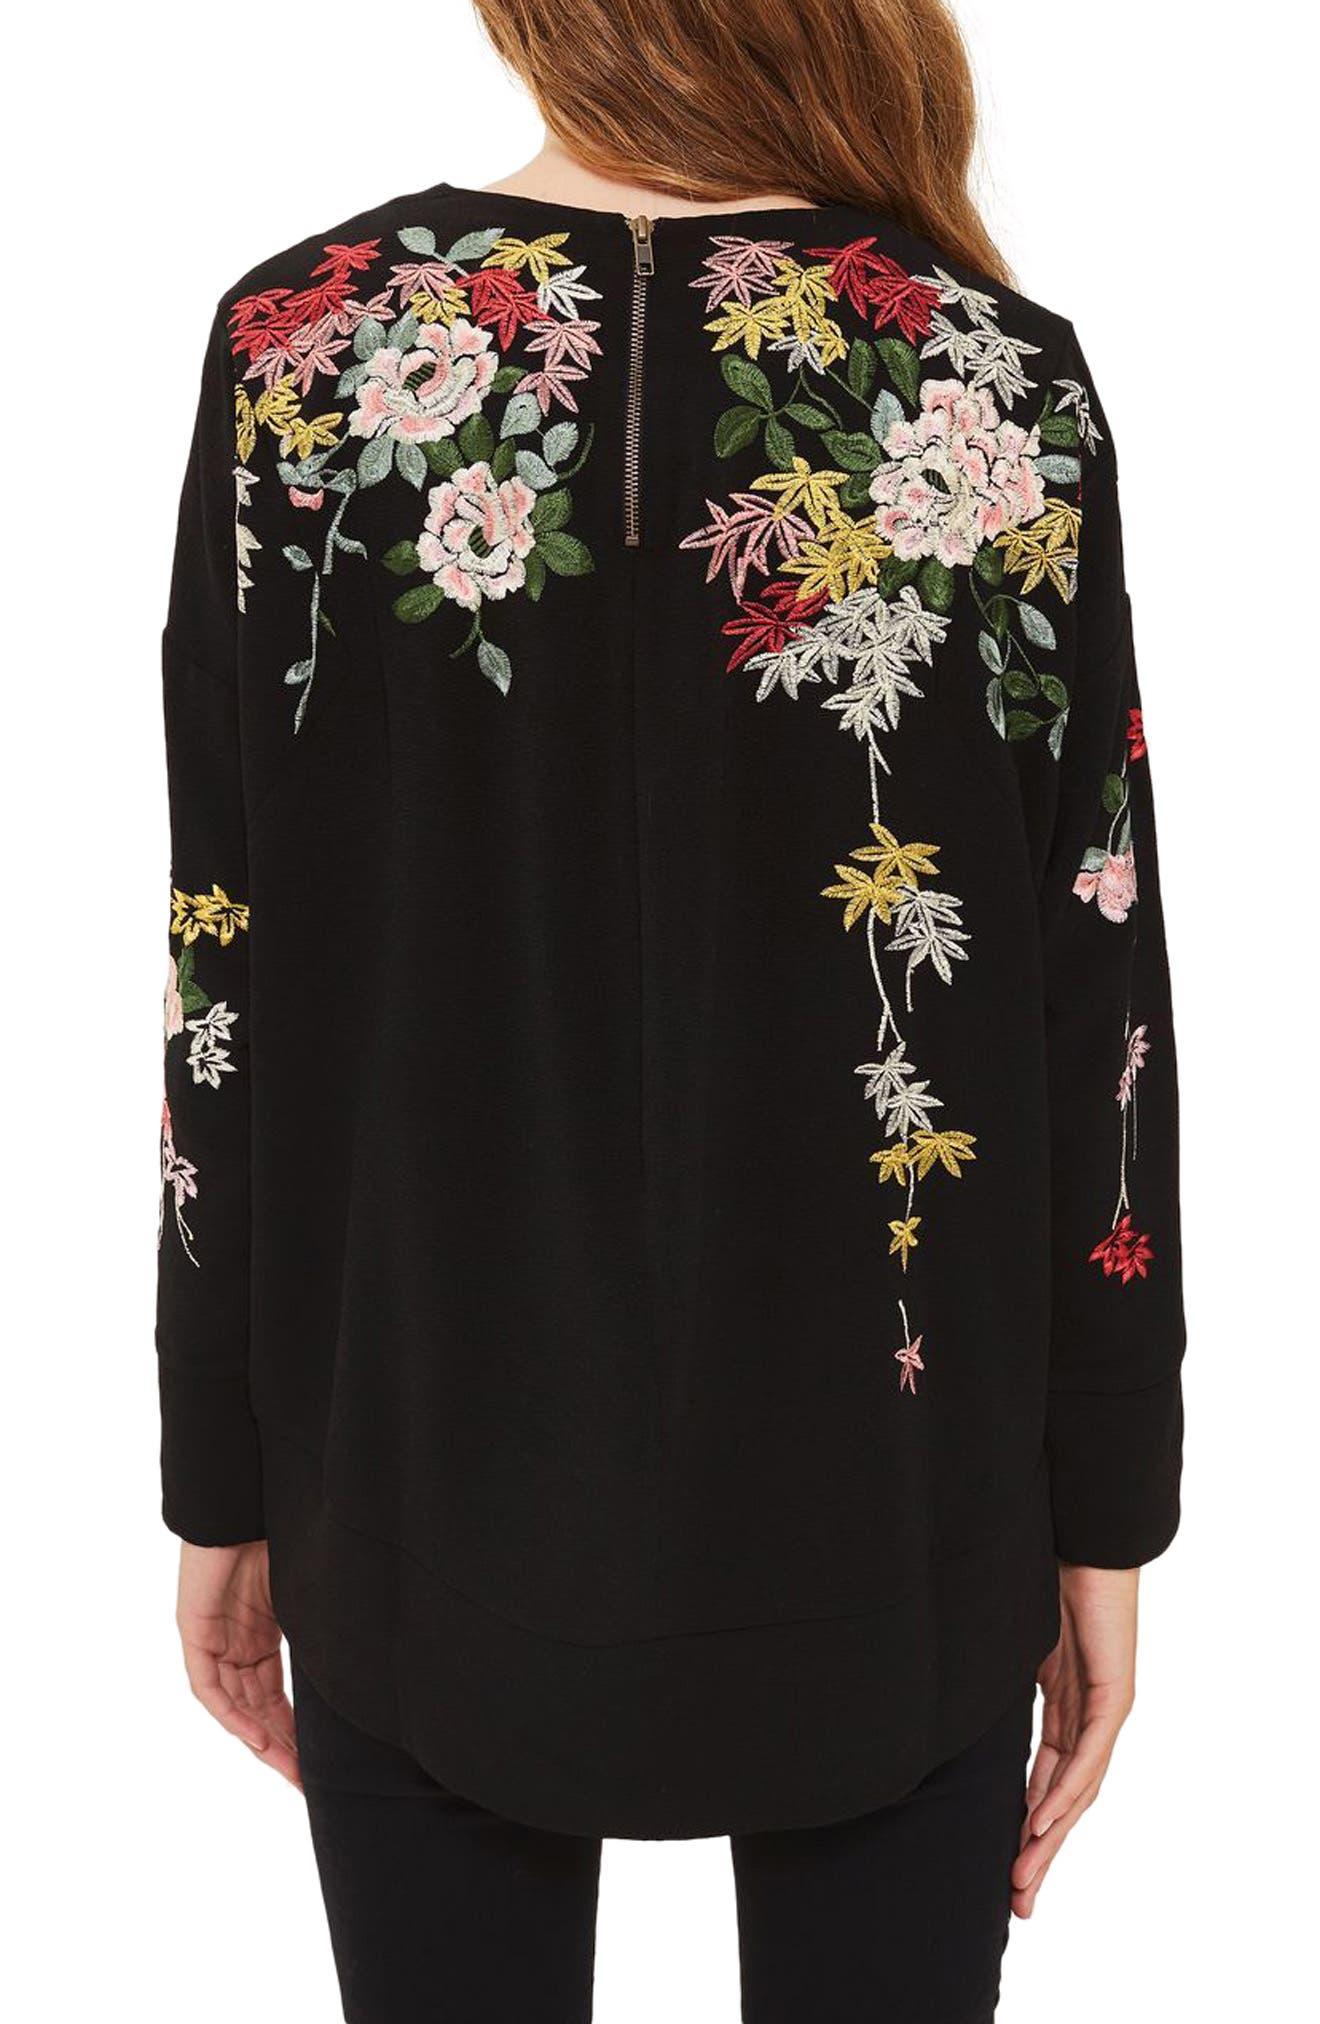 Kimono Embroidered Sweatshirt,                             Alternate thumbnail 2, color,                             001